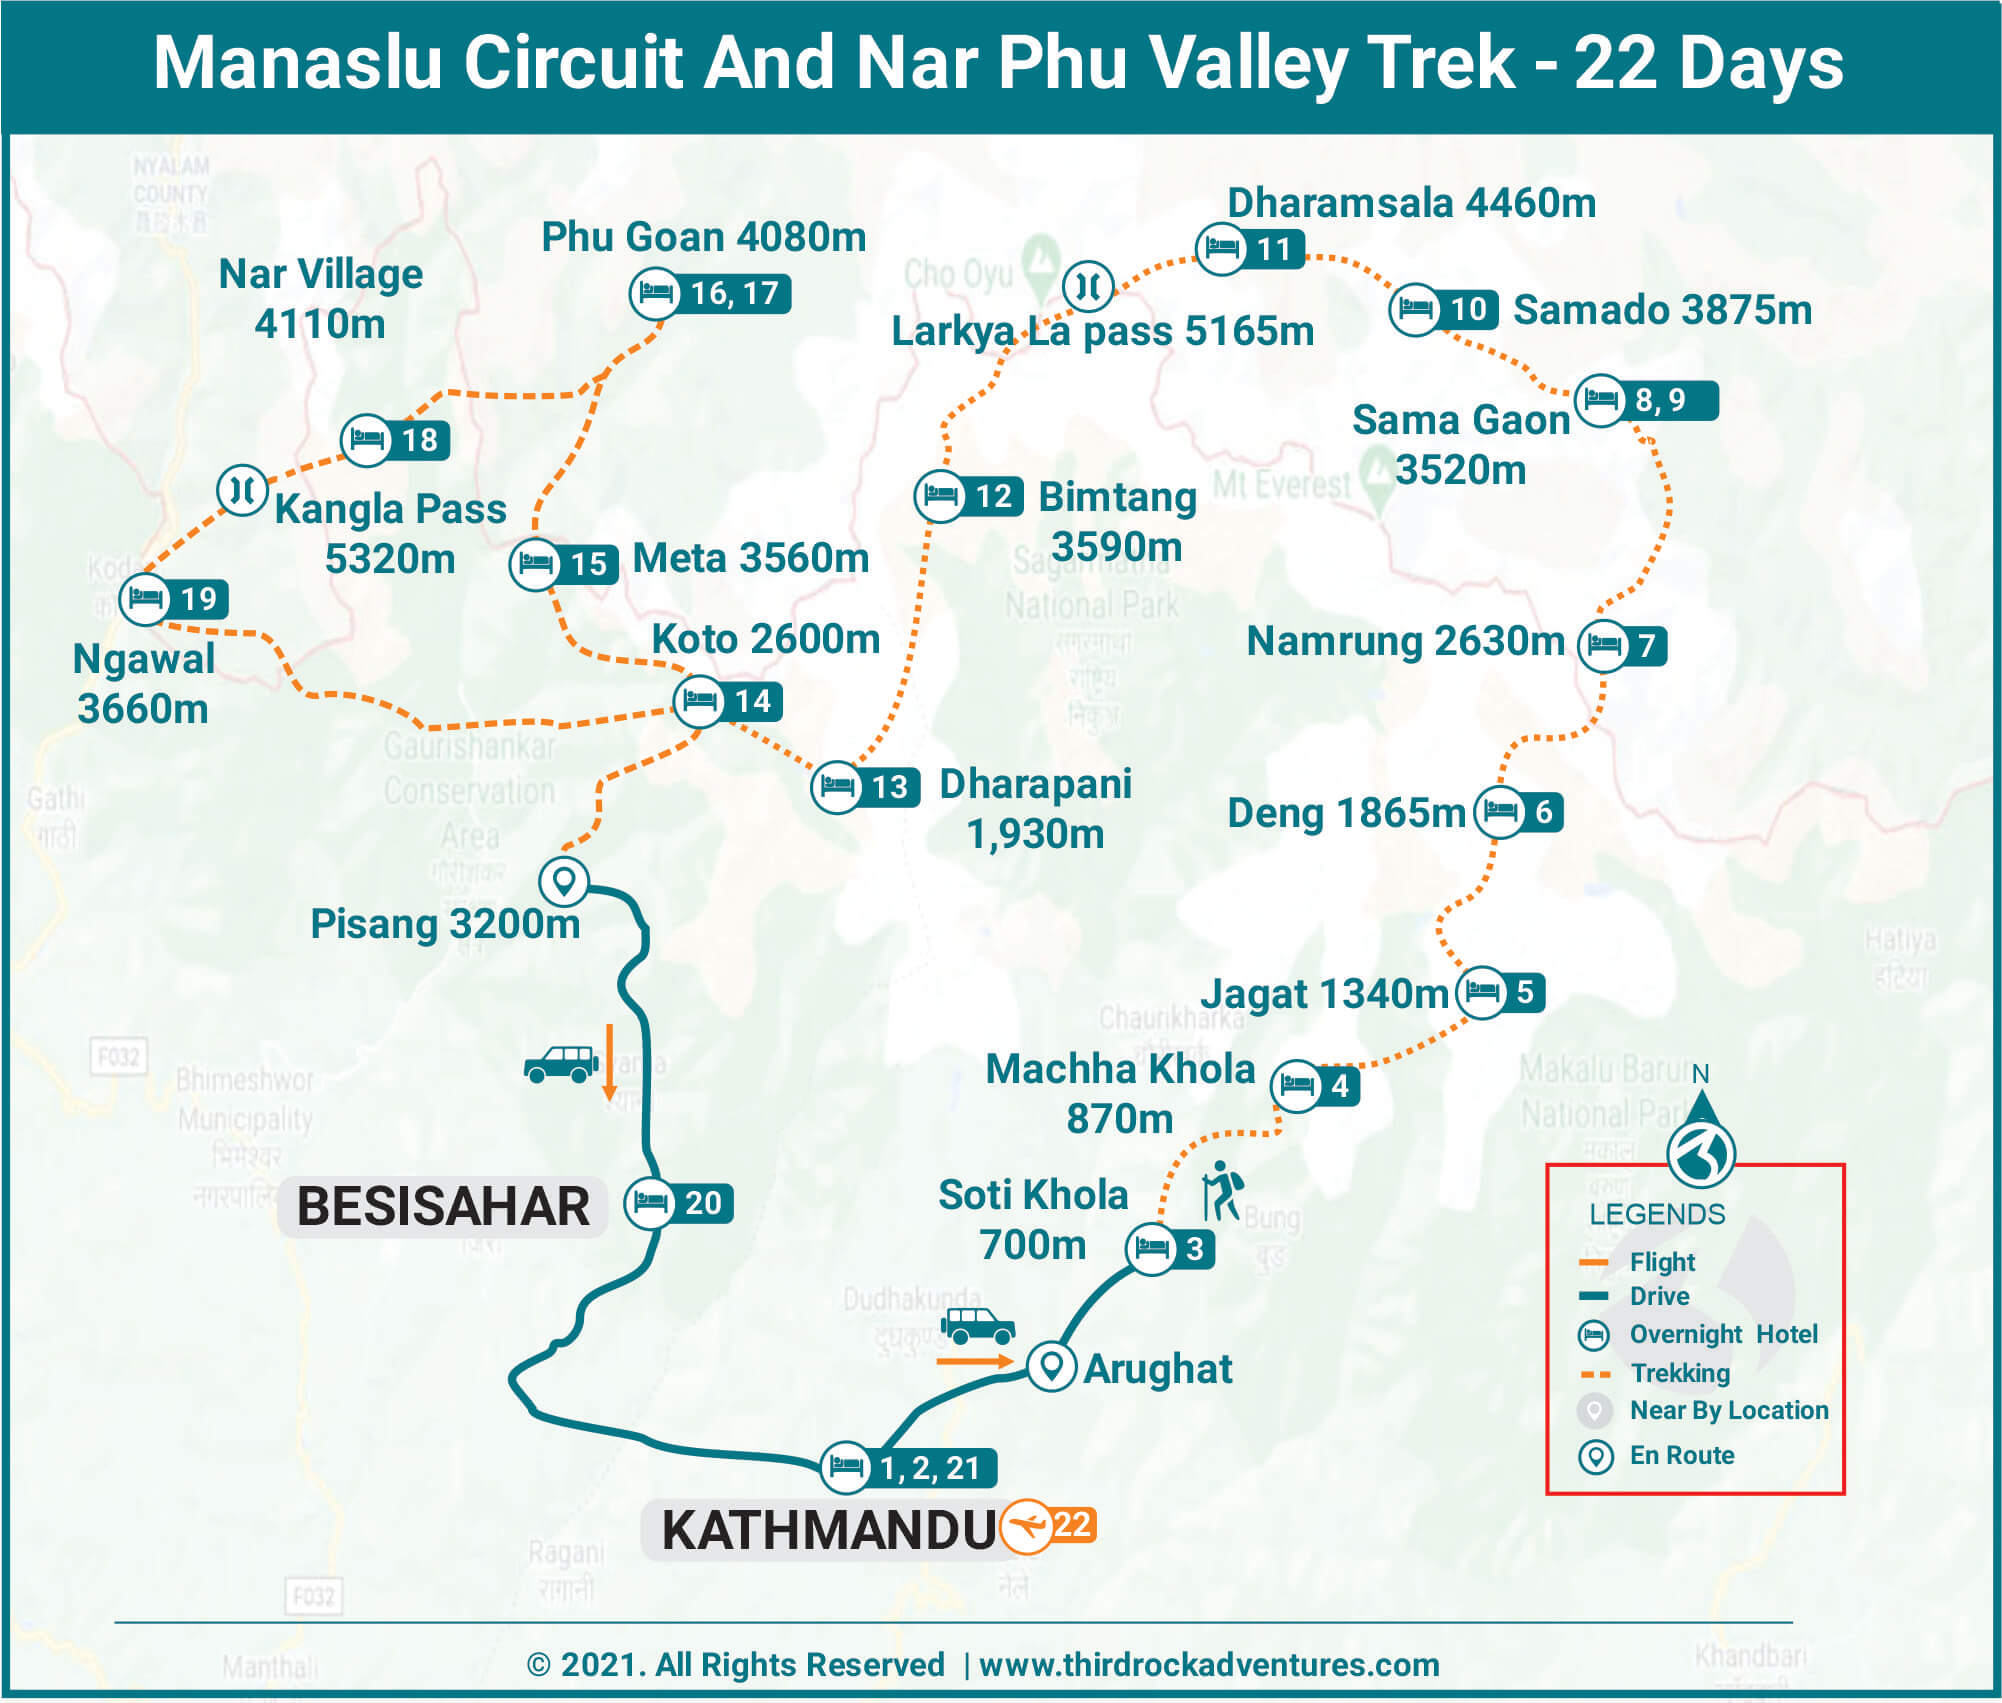 Manaslu Circuit and Nar Phu Valley Trek Route Map